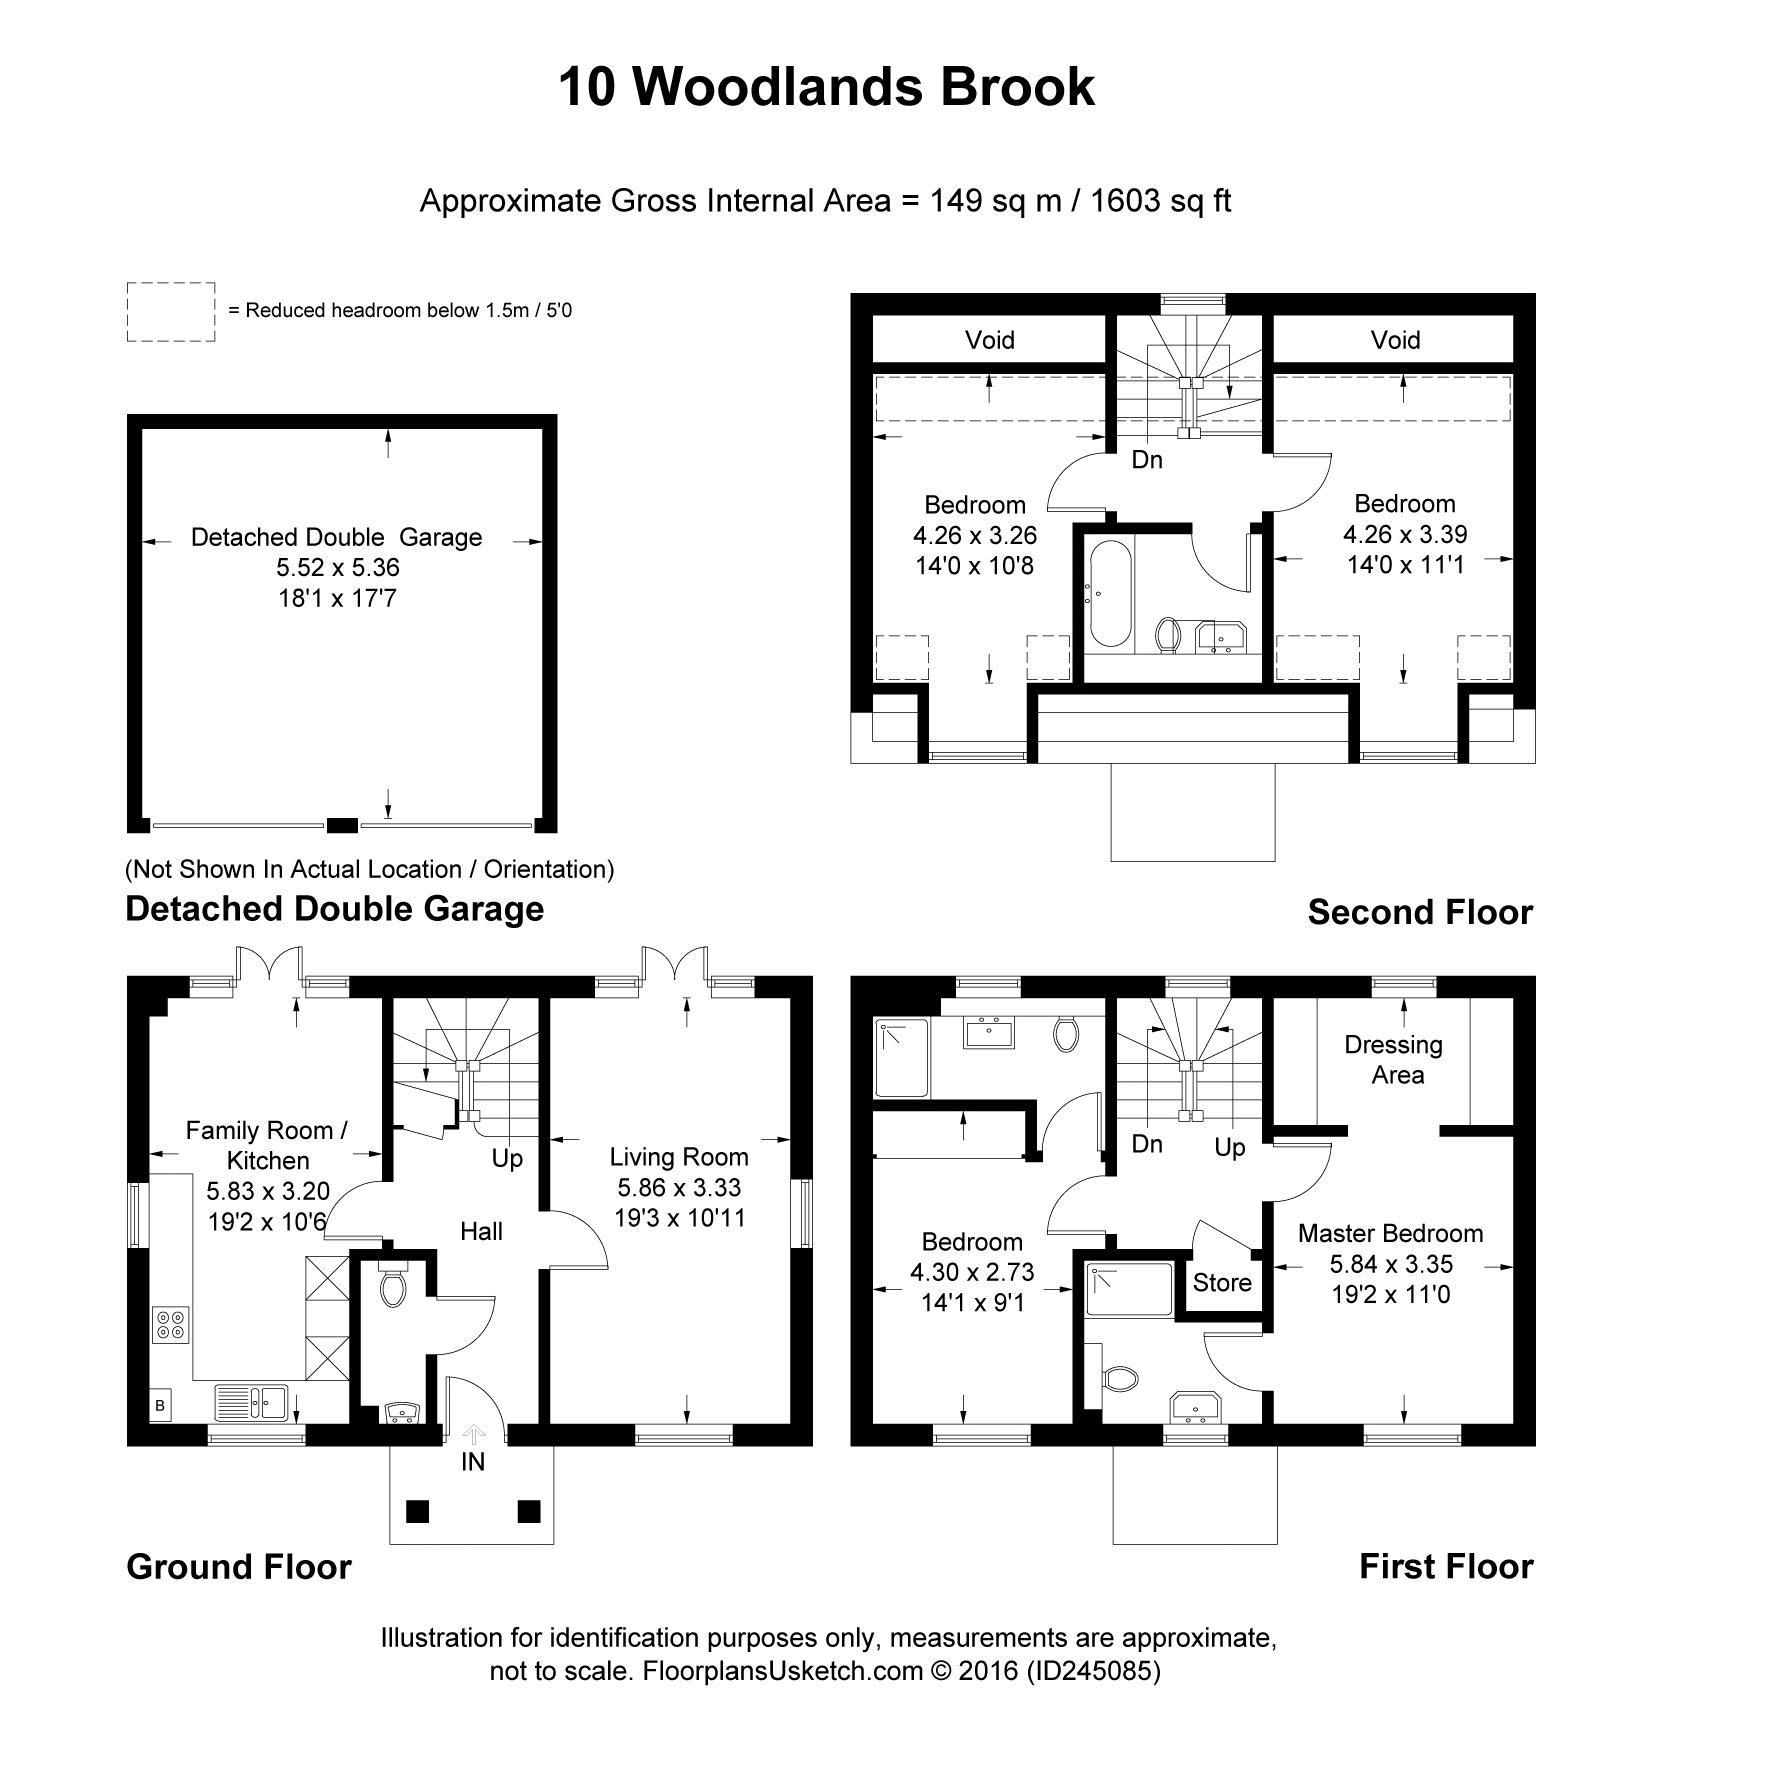 Woodlands Brook